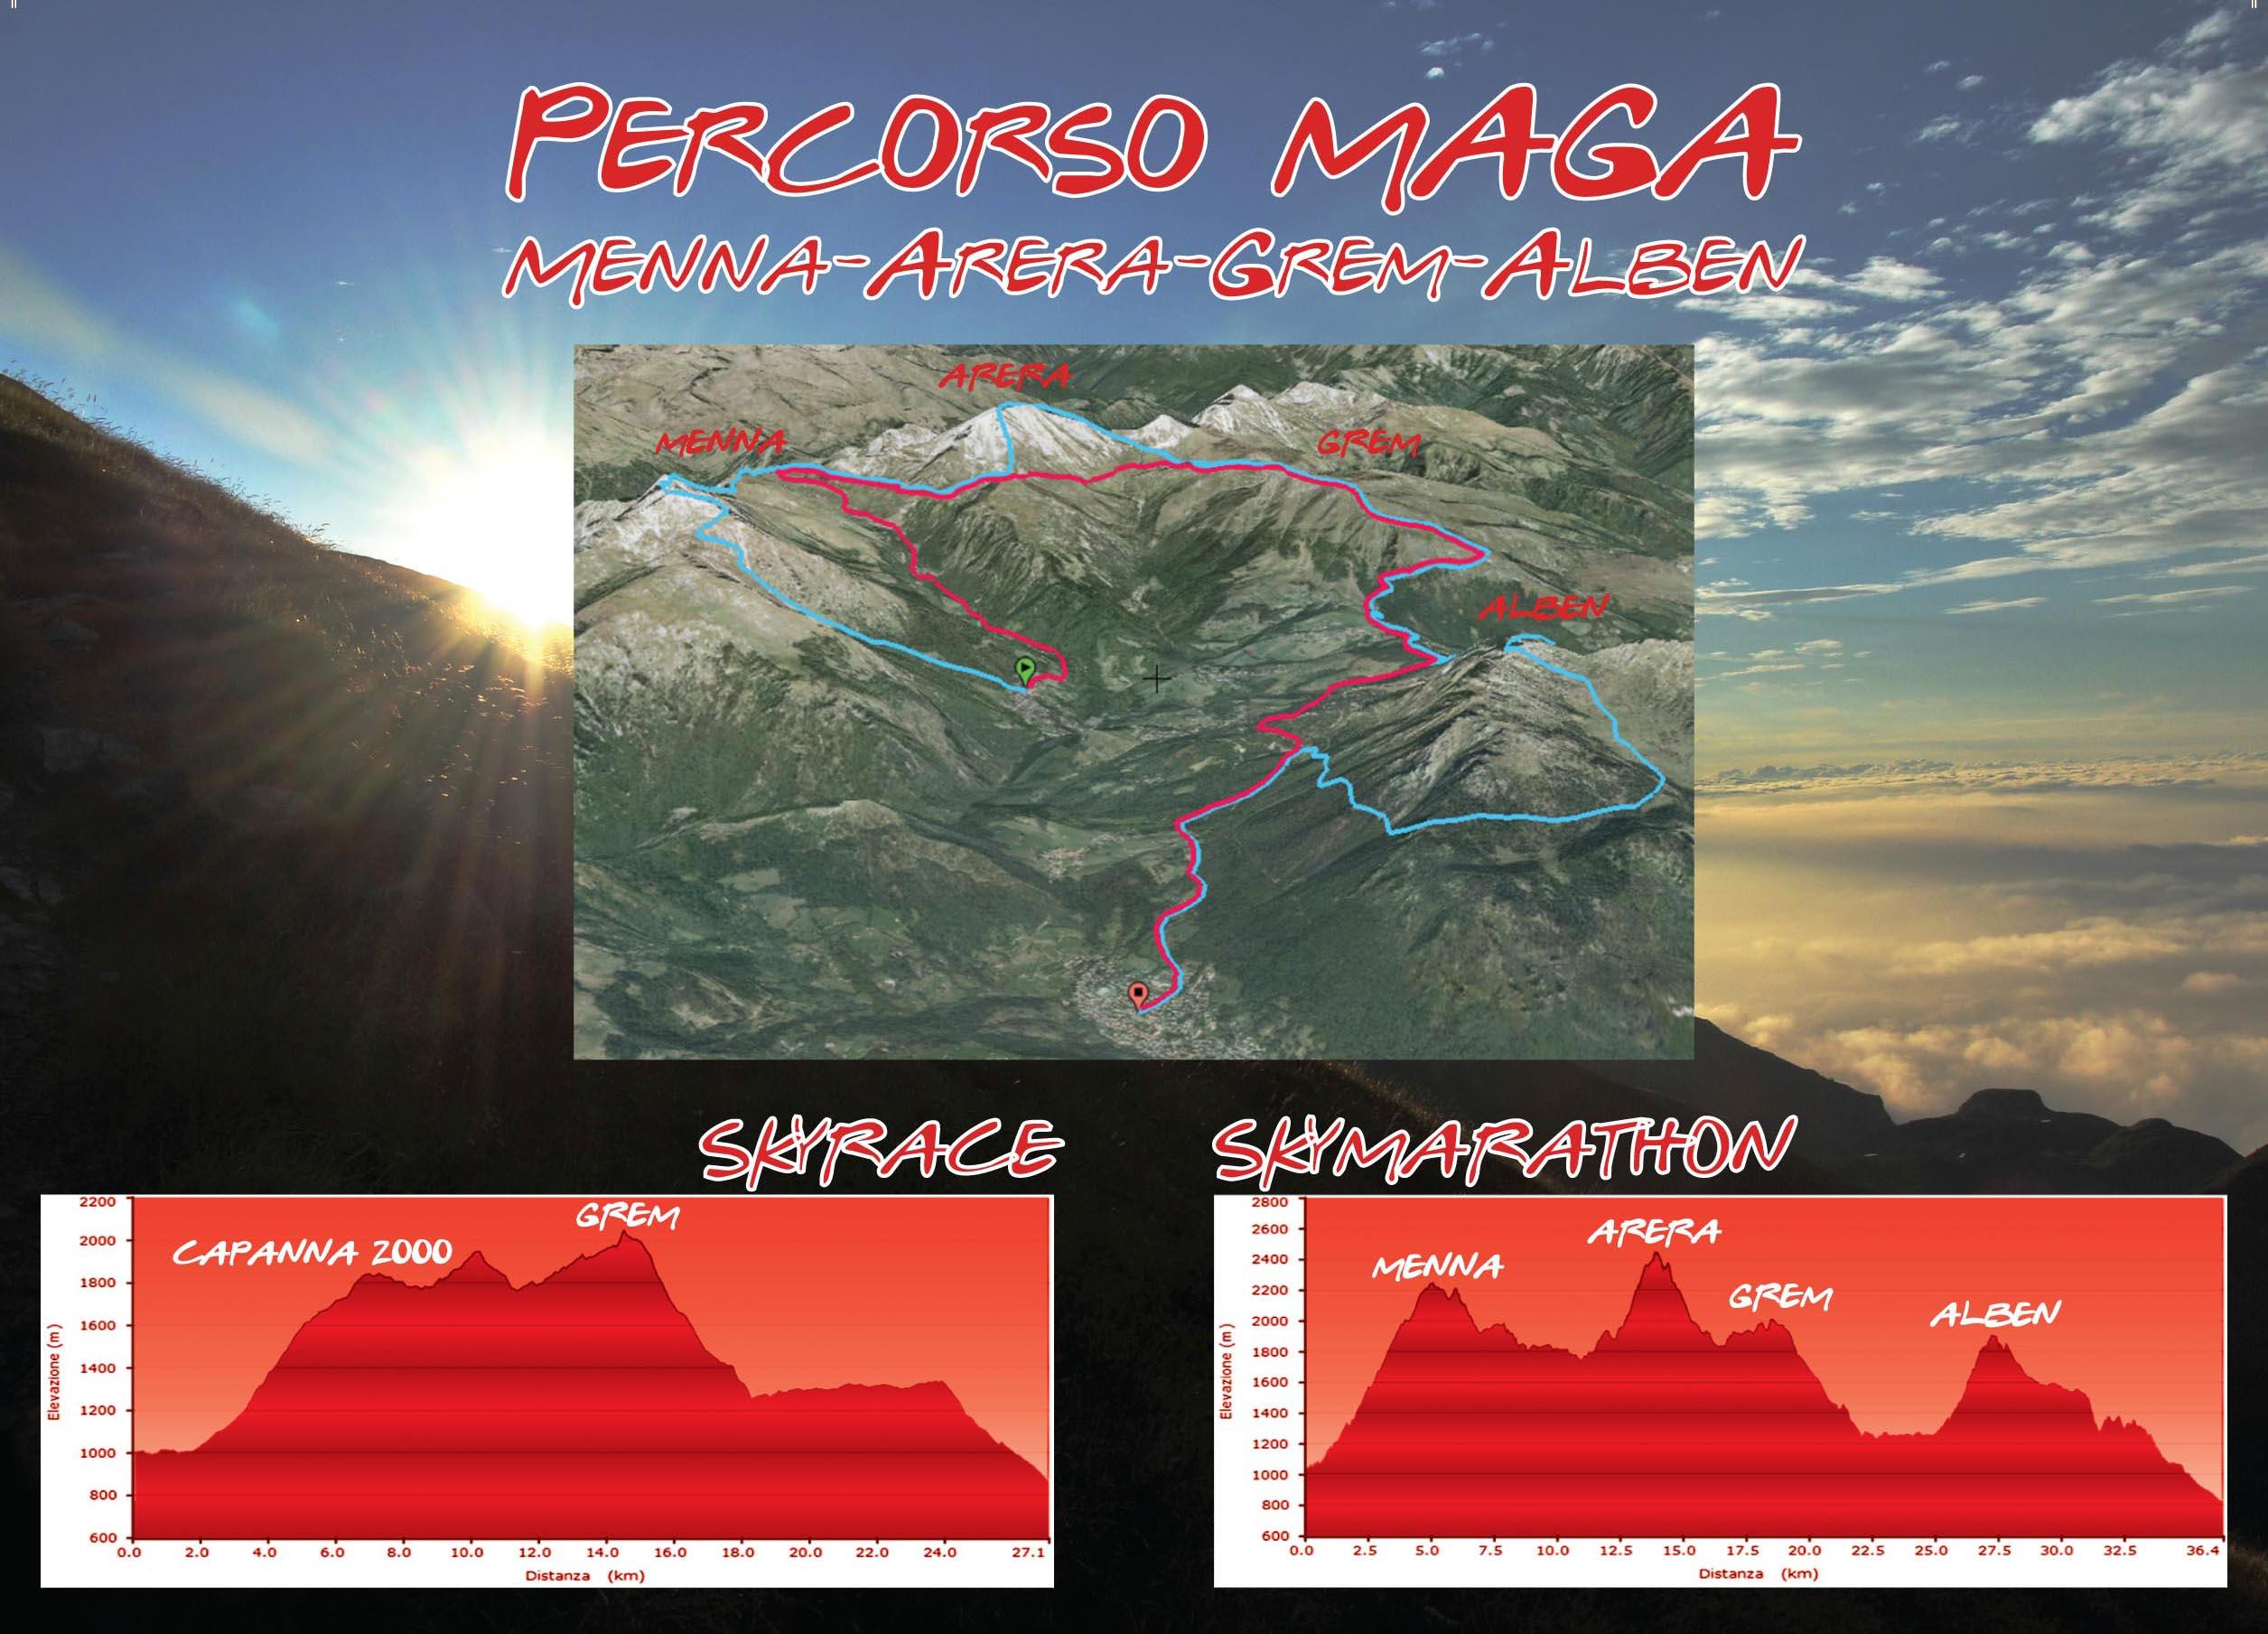 FlyerMaga2015-2